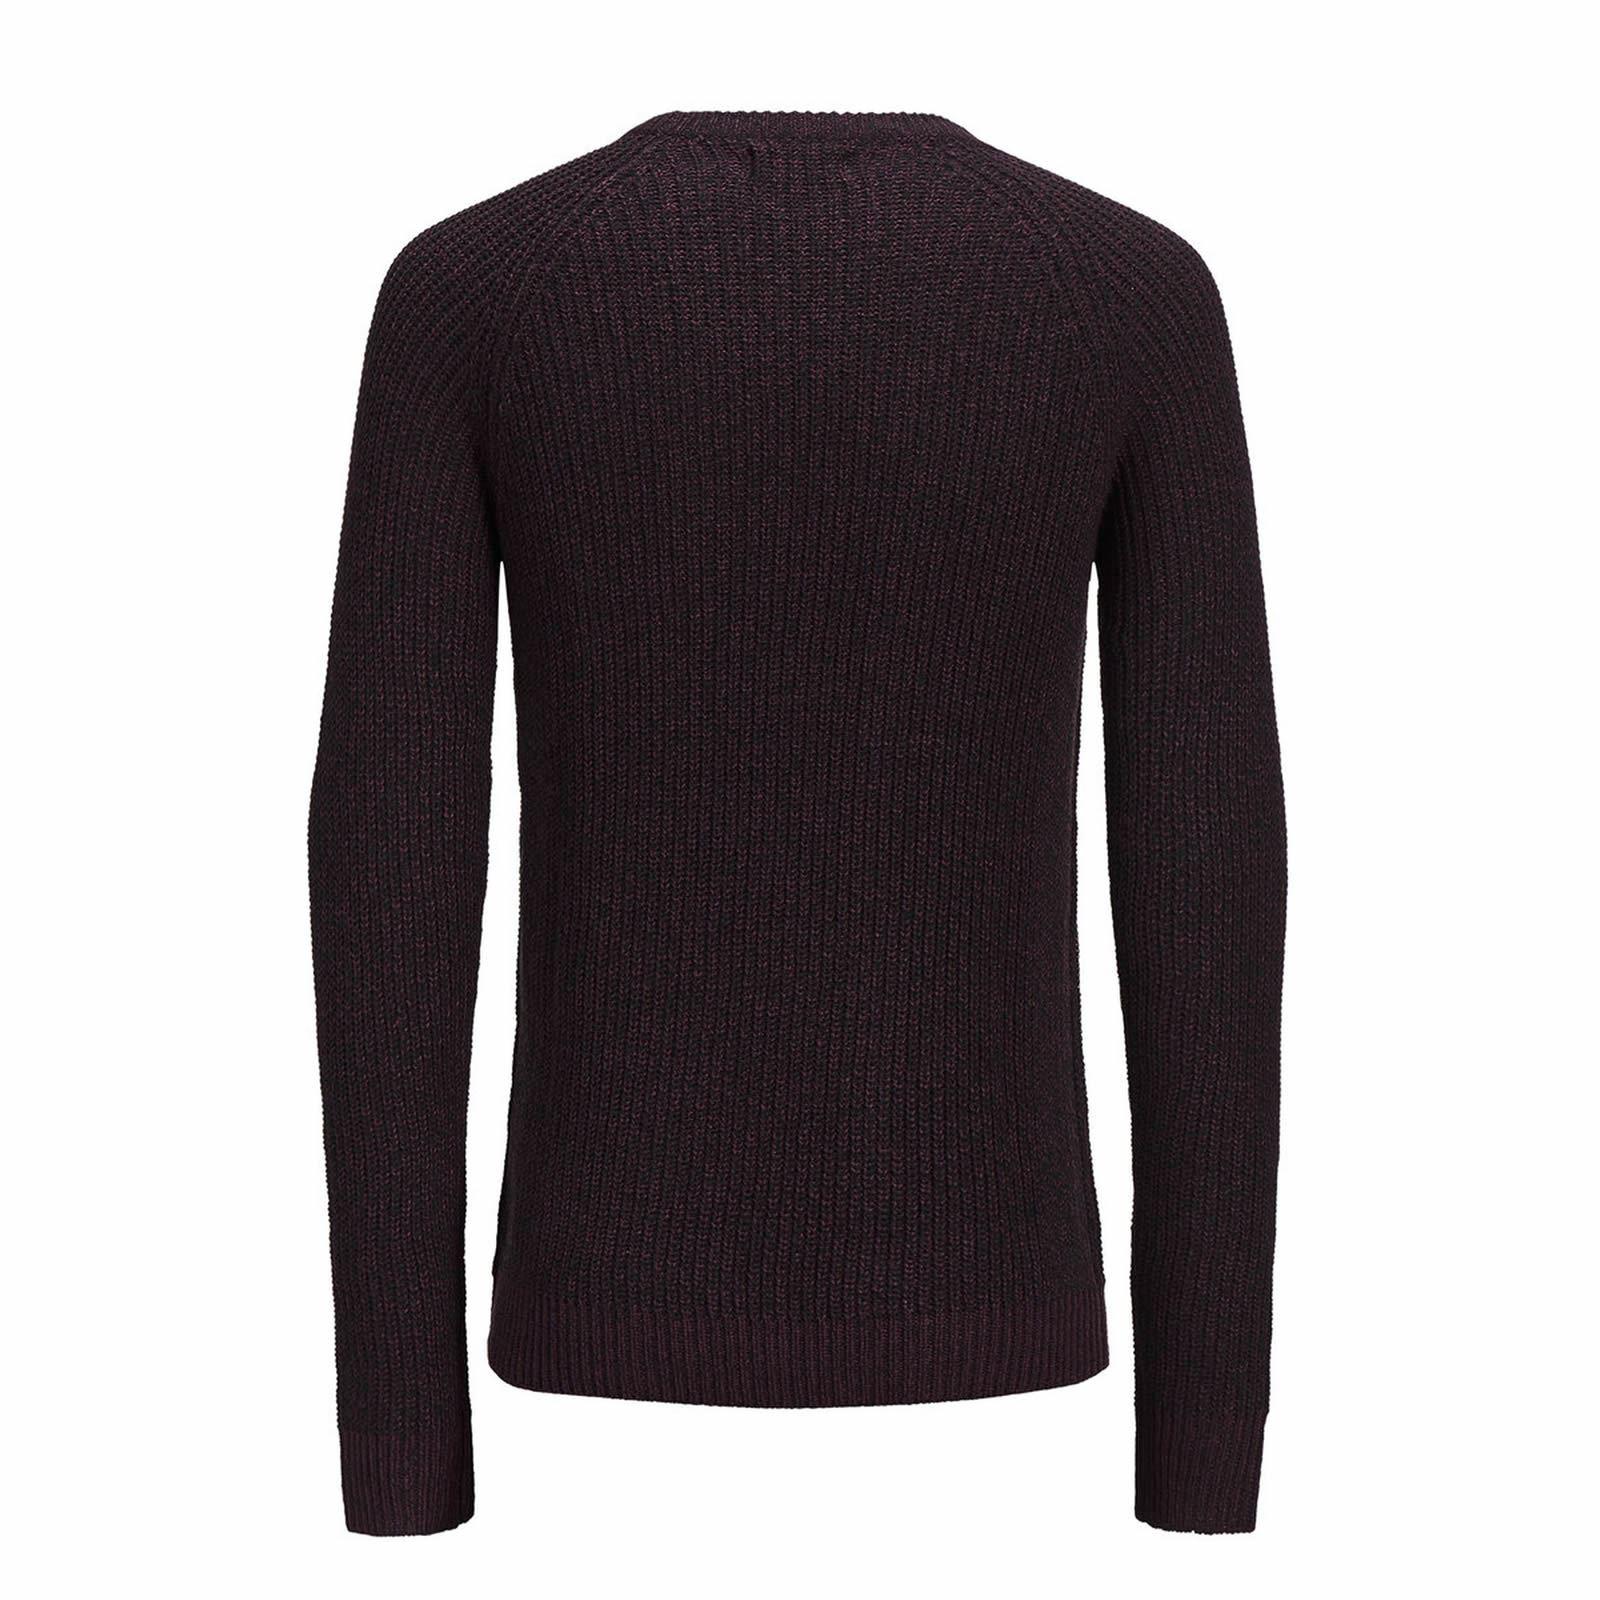 Jack-amp-Jones-Panneau-Pull-homme-a-encolure-ras-du-cou-Long-Tricot-Pull-Over-Sweater miniature 7